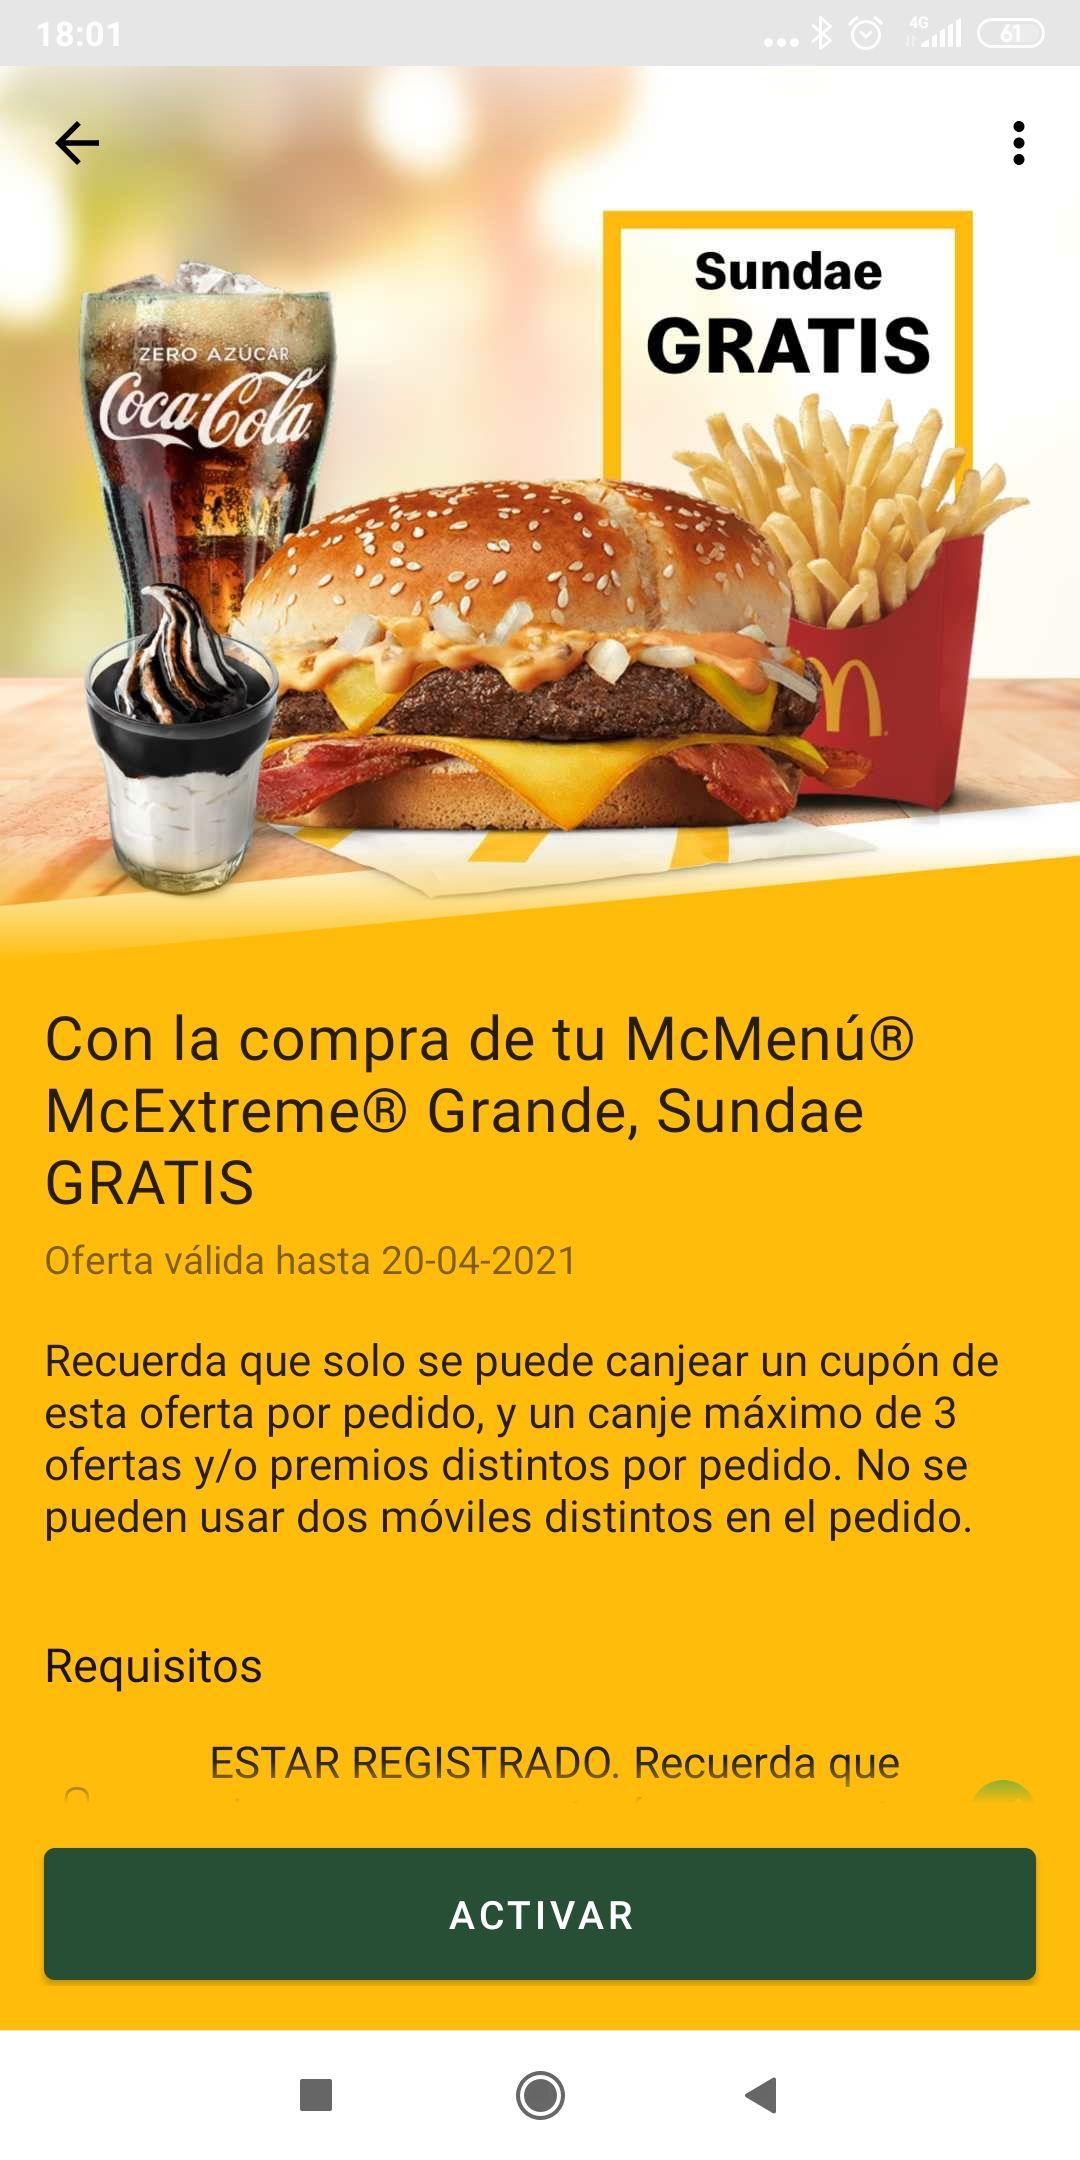 SUNDAE GRATIS en MC Donald's comprando MC EXTREME menú grande